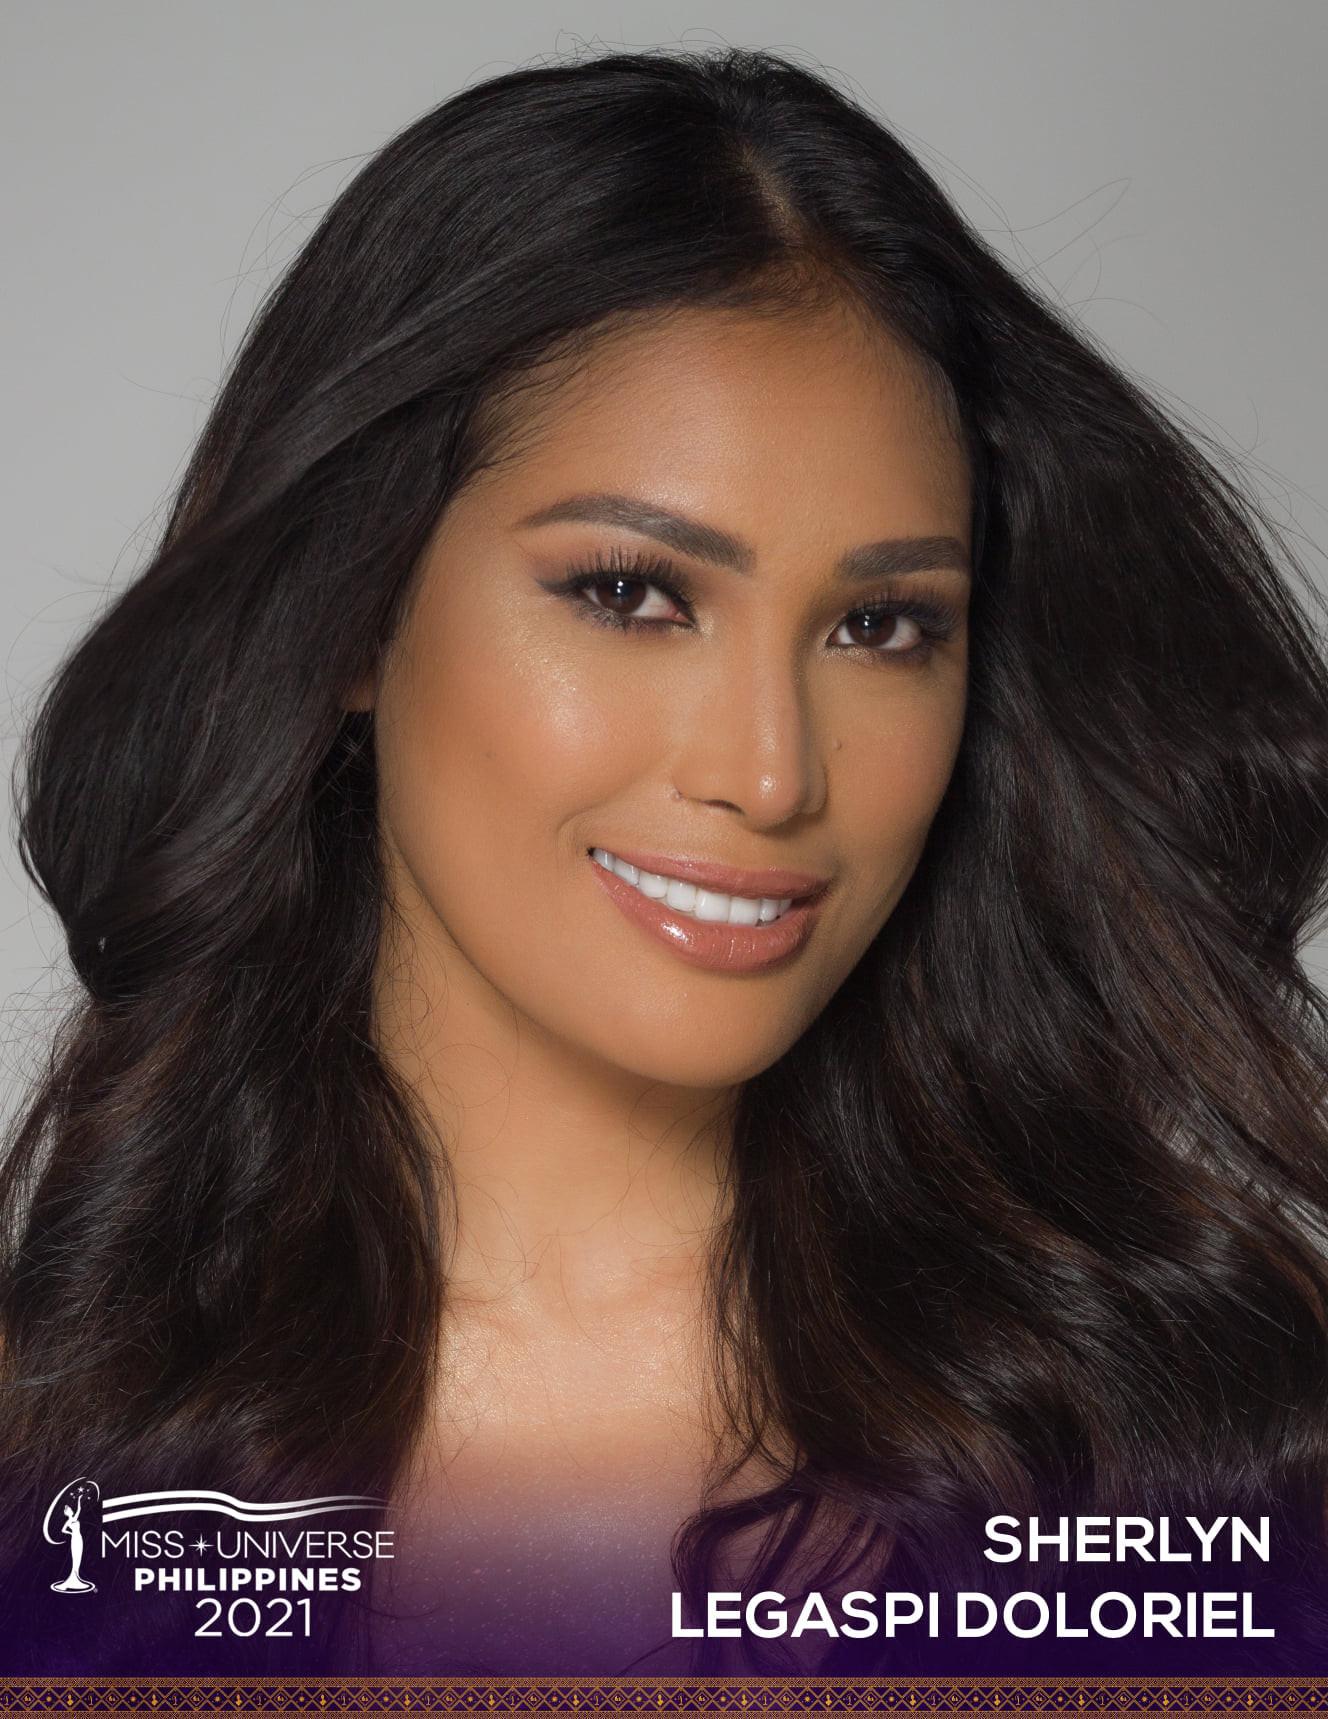 pre-candidatas a miss universe philippines 2021. - Página 2 AlfJXj